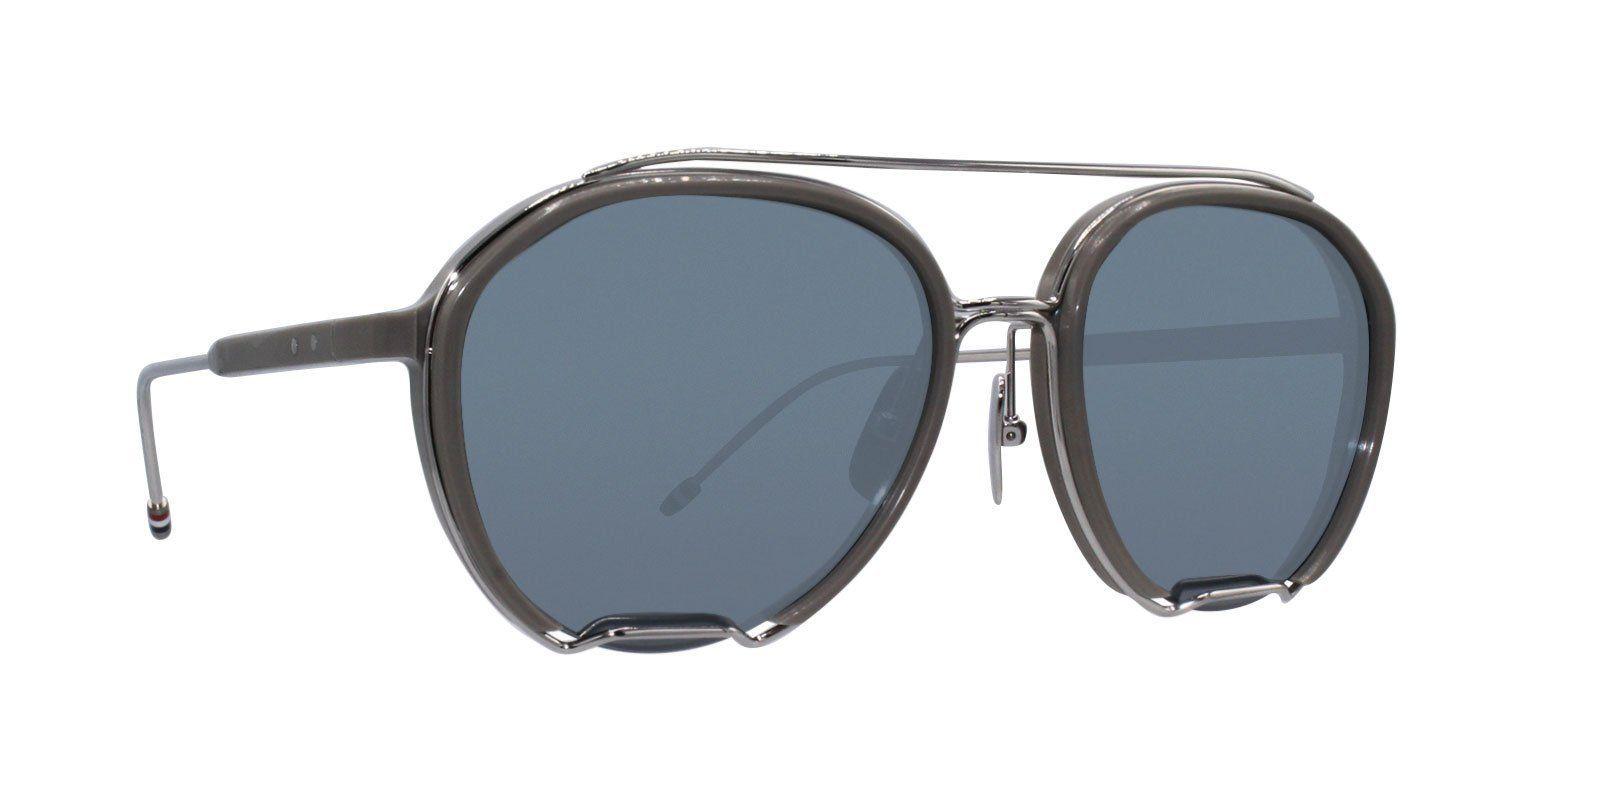 38dfd0681d56 Thom Browne - TB-810 Gray - Silver-sunglasses-Designer Eyes